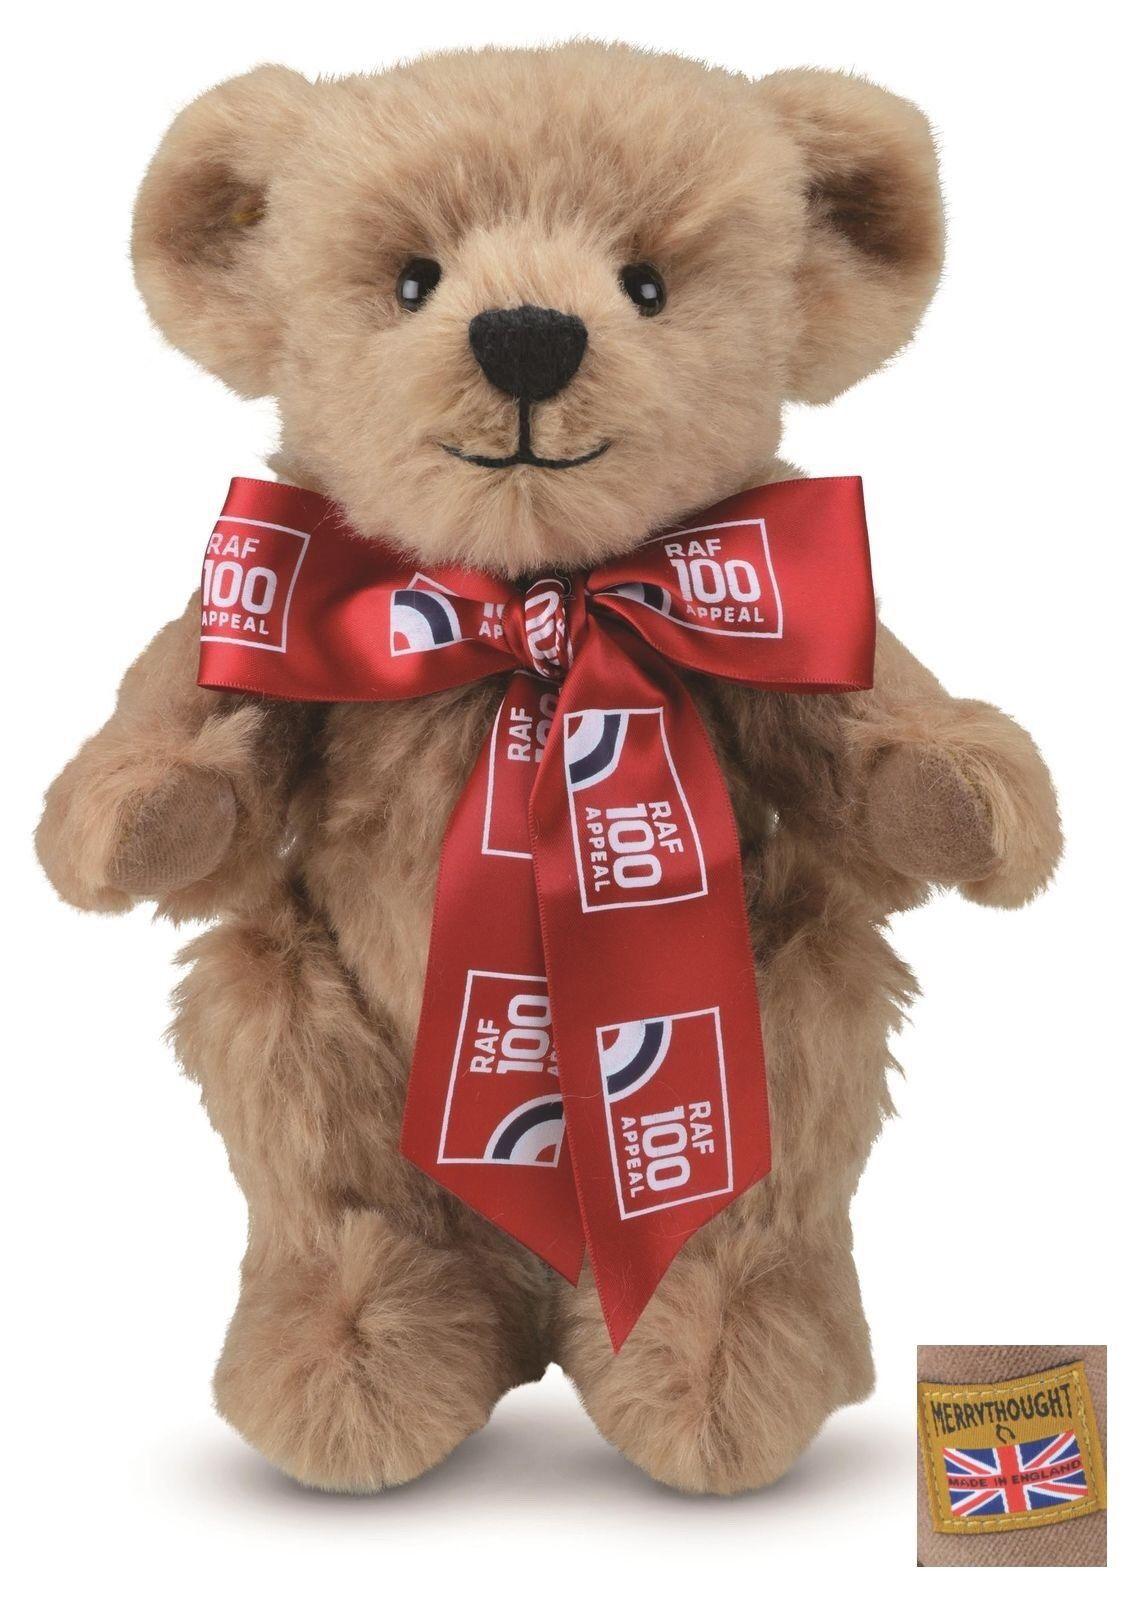 MERRYTHOUGHT HANDMADE RAF 128 SQUADRON - ROYAL AIR FORCE CENTENARY TEDDY BEAR